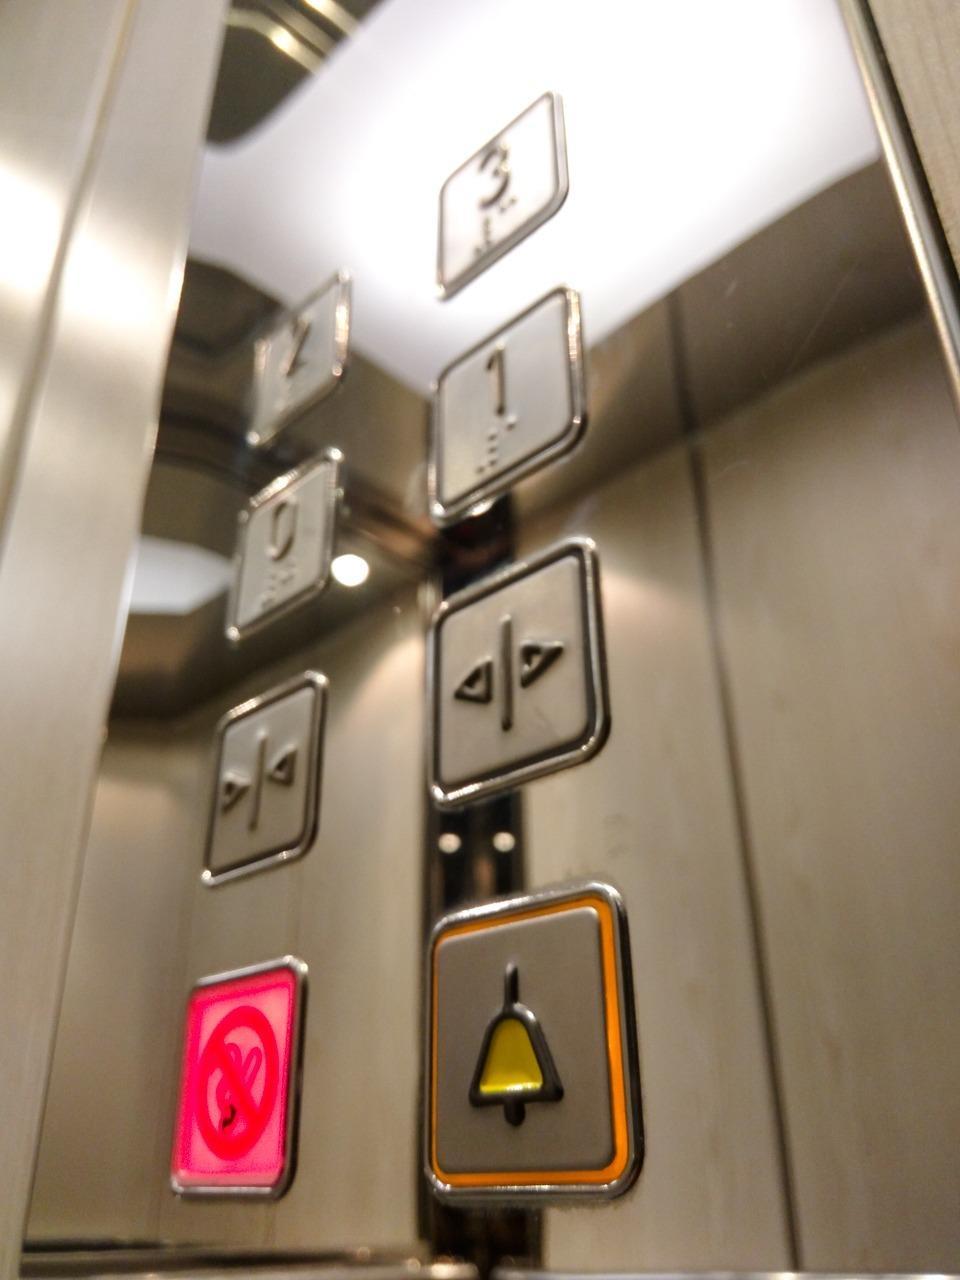 zlift-erga-lifts-36 Εγκατάσταση Ανελκυστήρα - Ρόδος